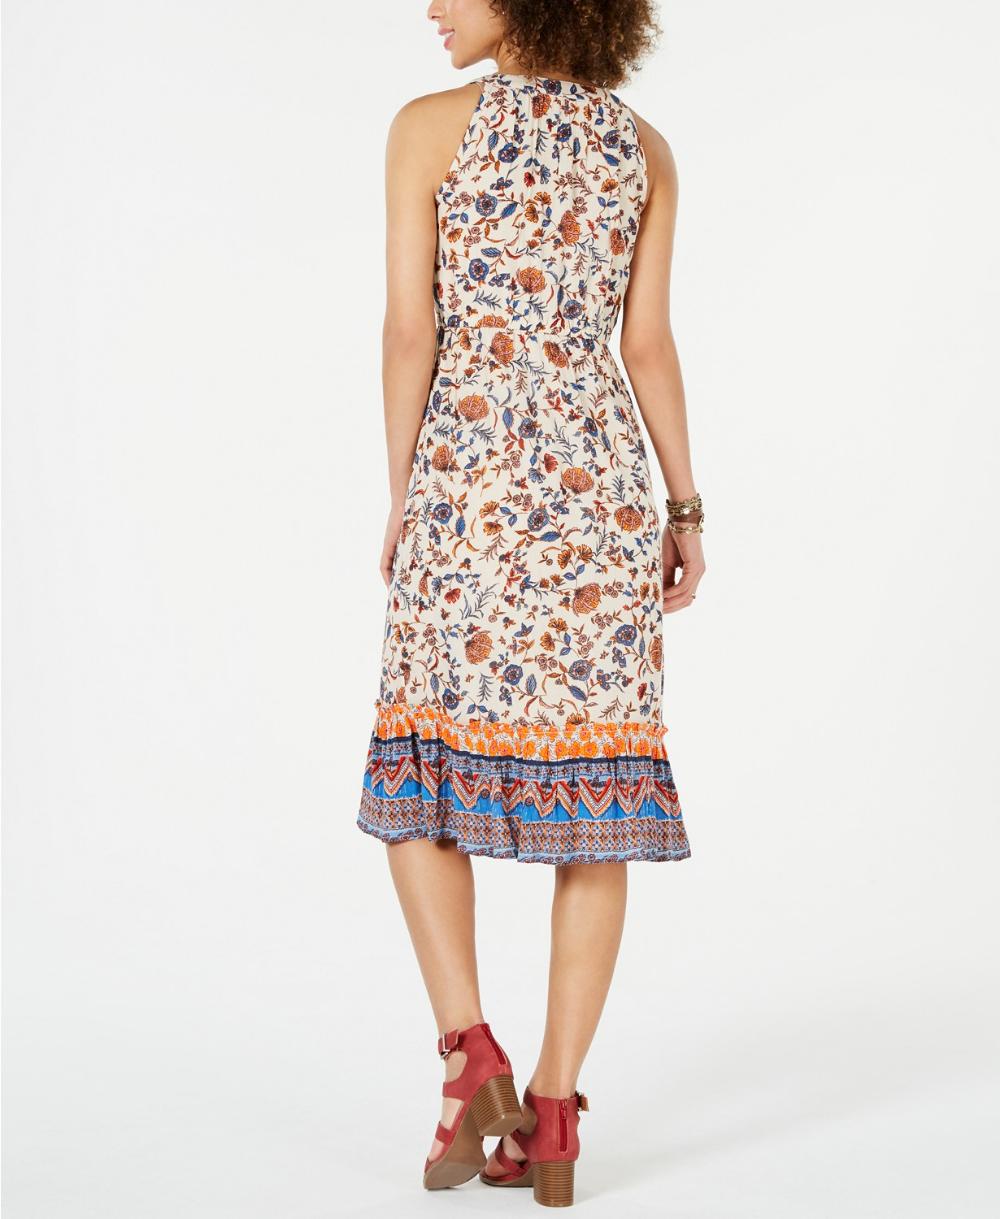 Style Co Paisley Flower Midi Dress Created For Macy S Reviews Dresses Women Macy S Flower Midi Dress Dresses Midi Dress [ 1219 x 1000 Pixel ]